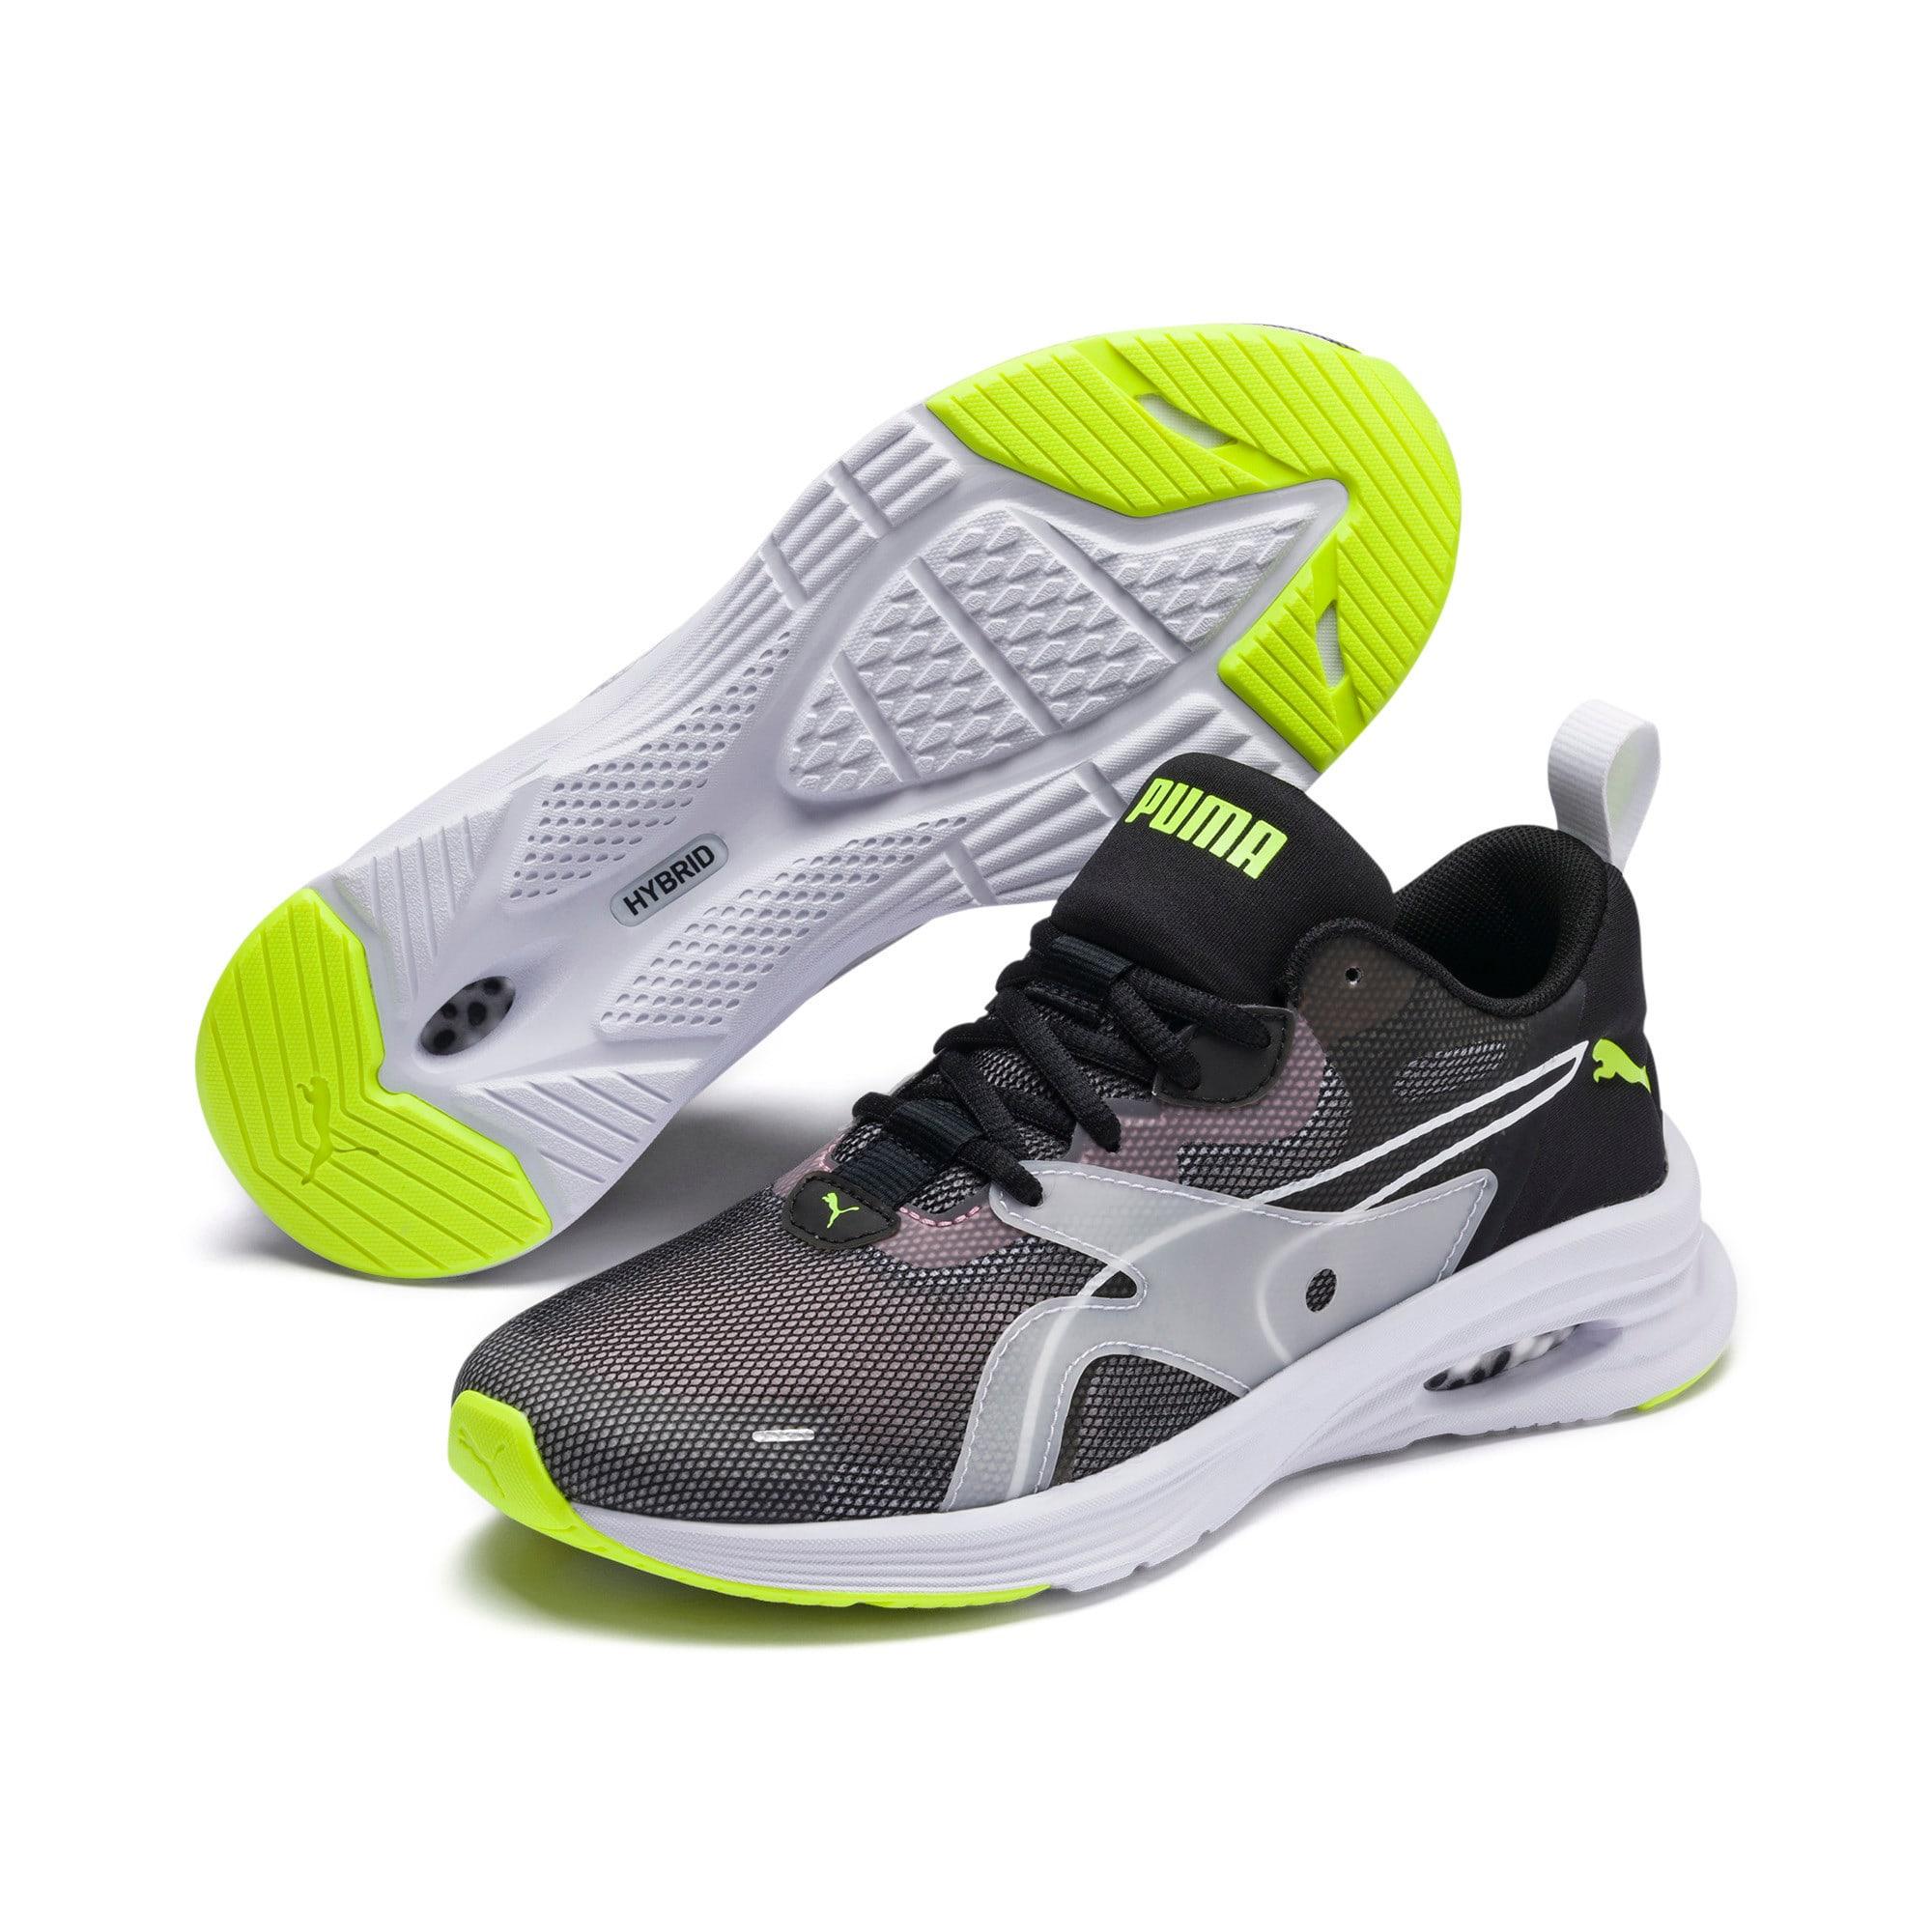 Thumbnail 8 of HYBRID Fuego Shift Women's Running Shoes, Puma Black-Bridal Rose, medium-IND